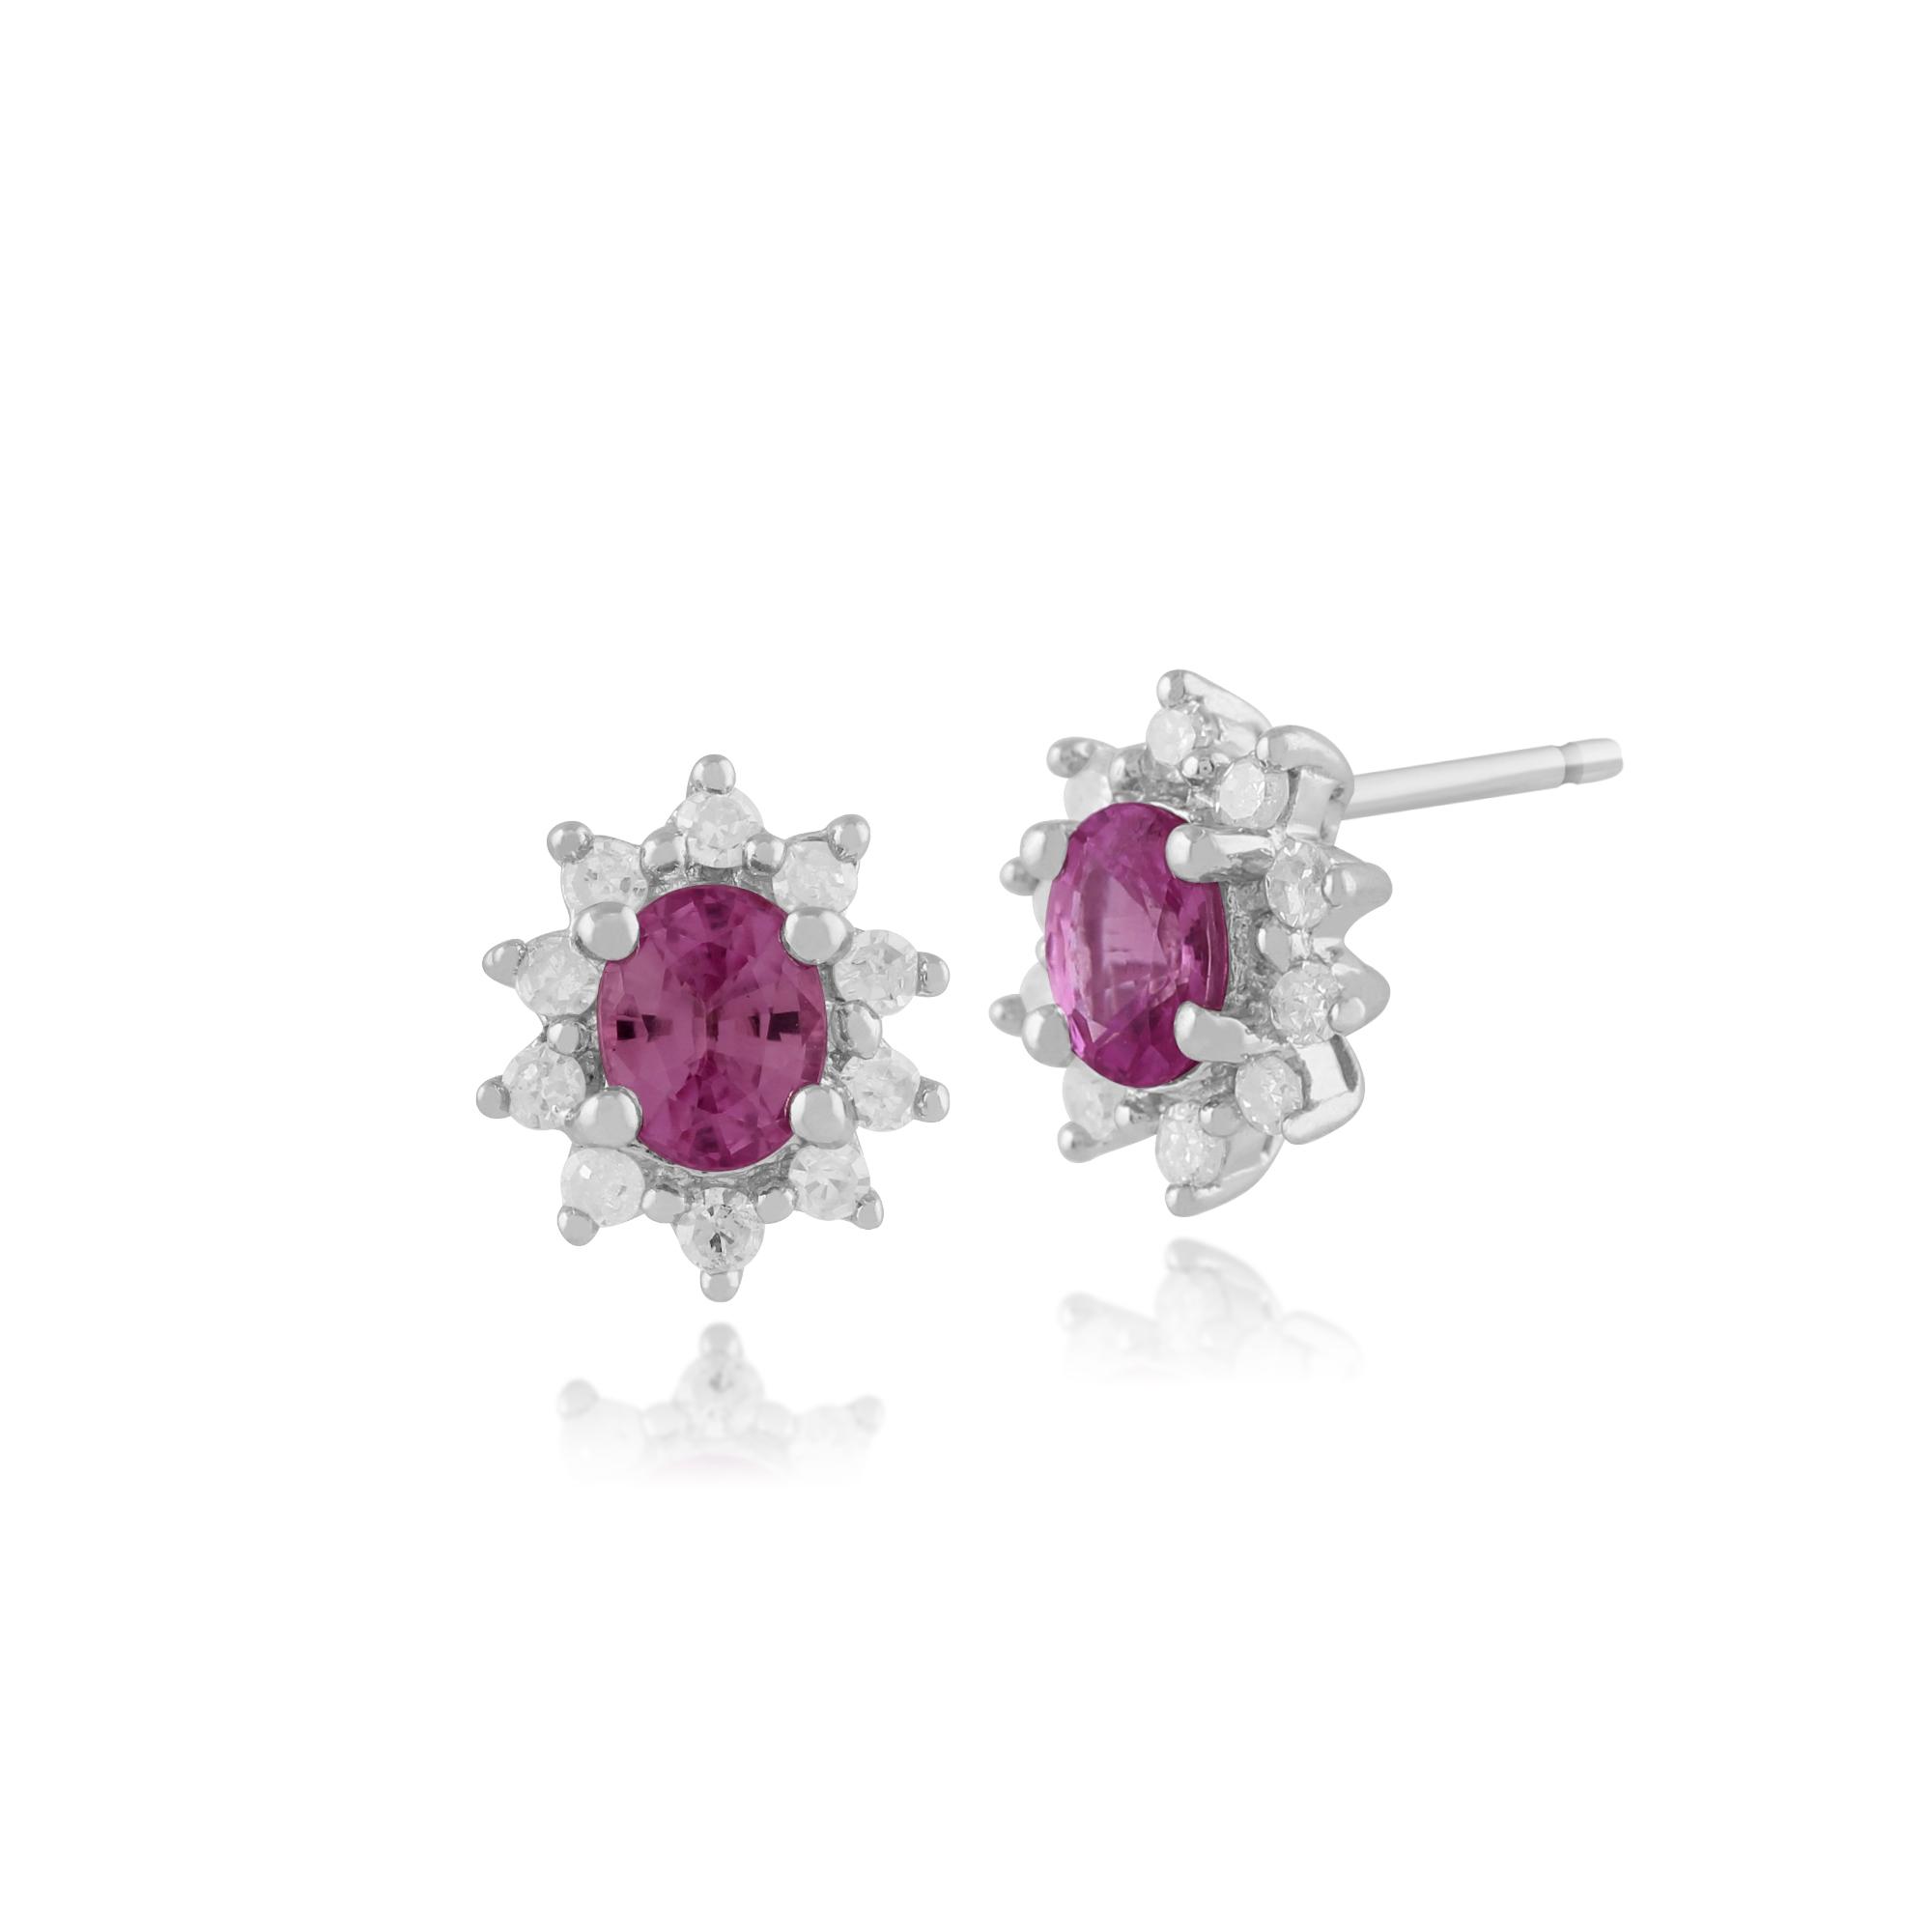 9ct White Gold Pink Sapphire & Diamond Stud Earrings